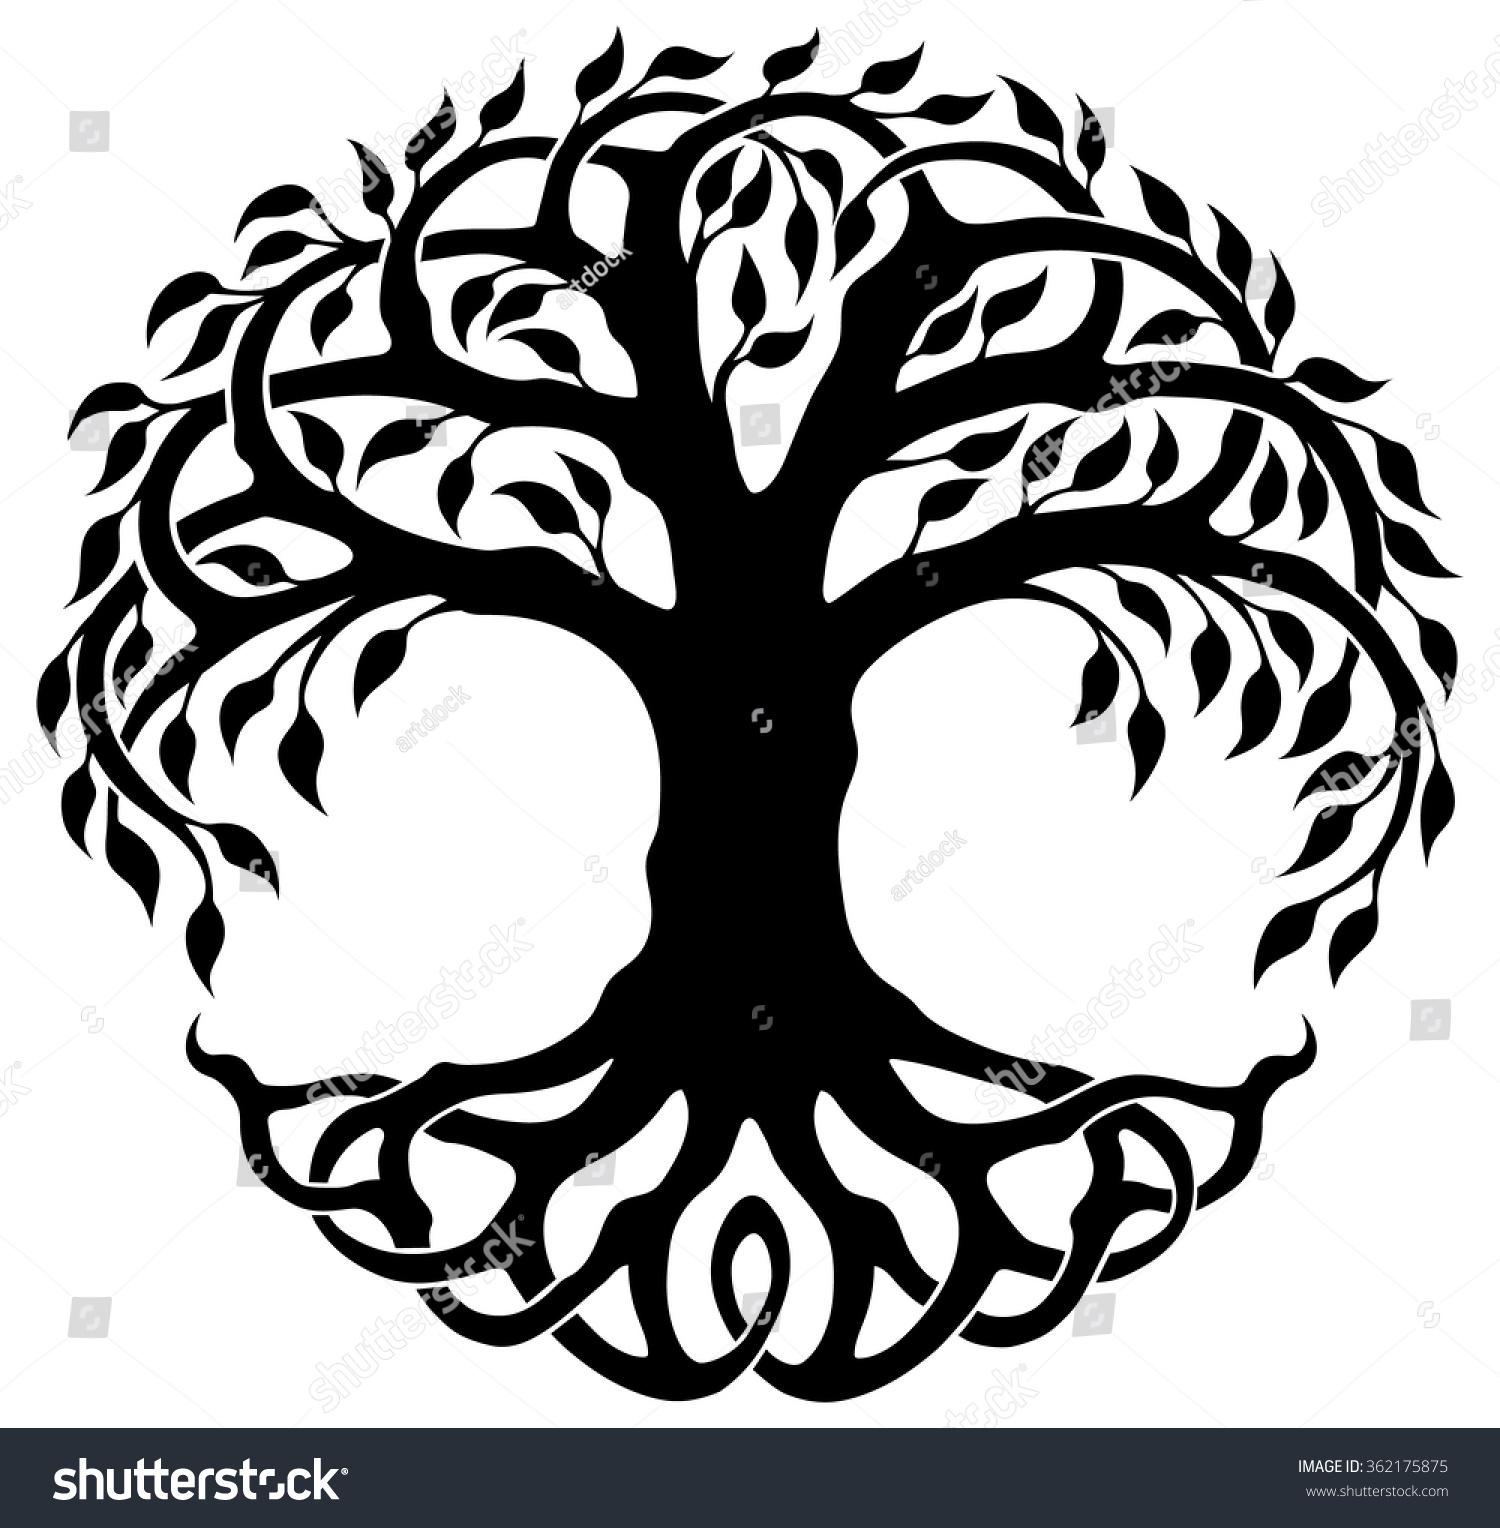 1500x1528 Tree Of Life Yggdrasil World Tree Vector Art Illustration Ideas